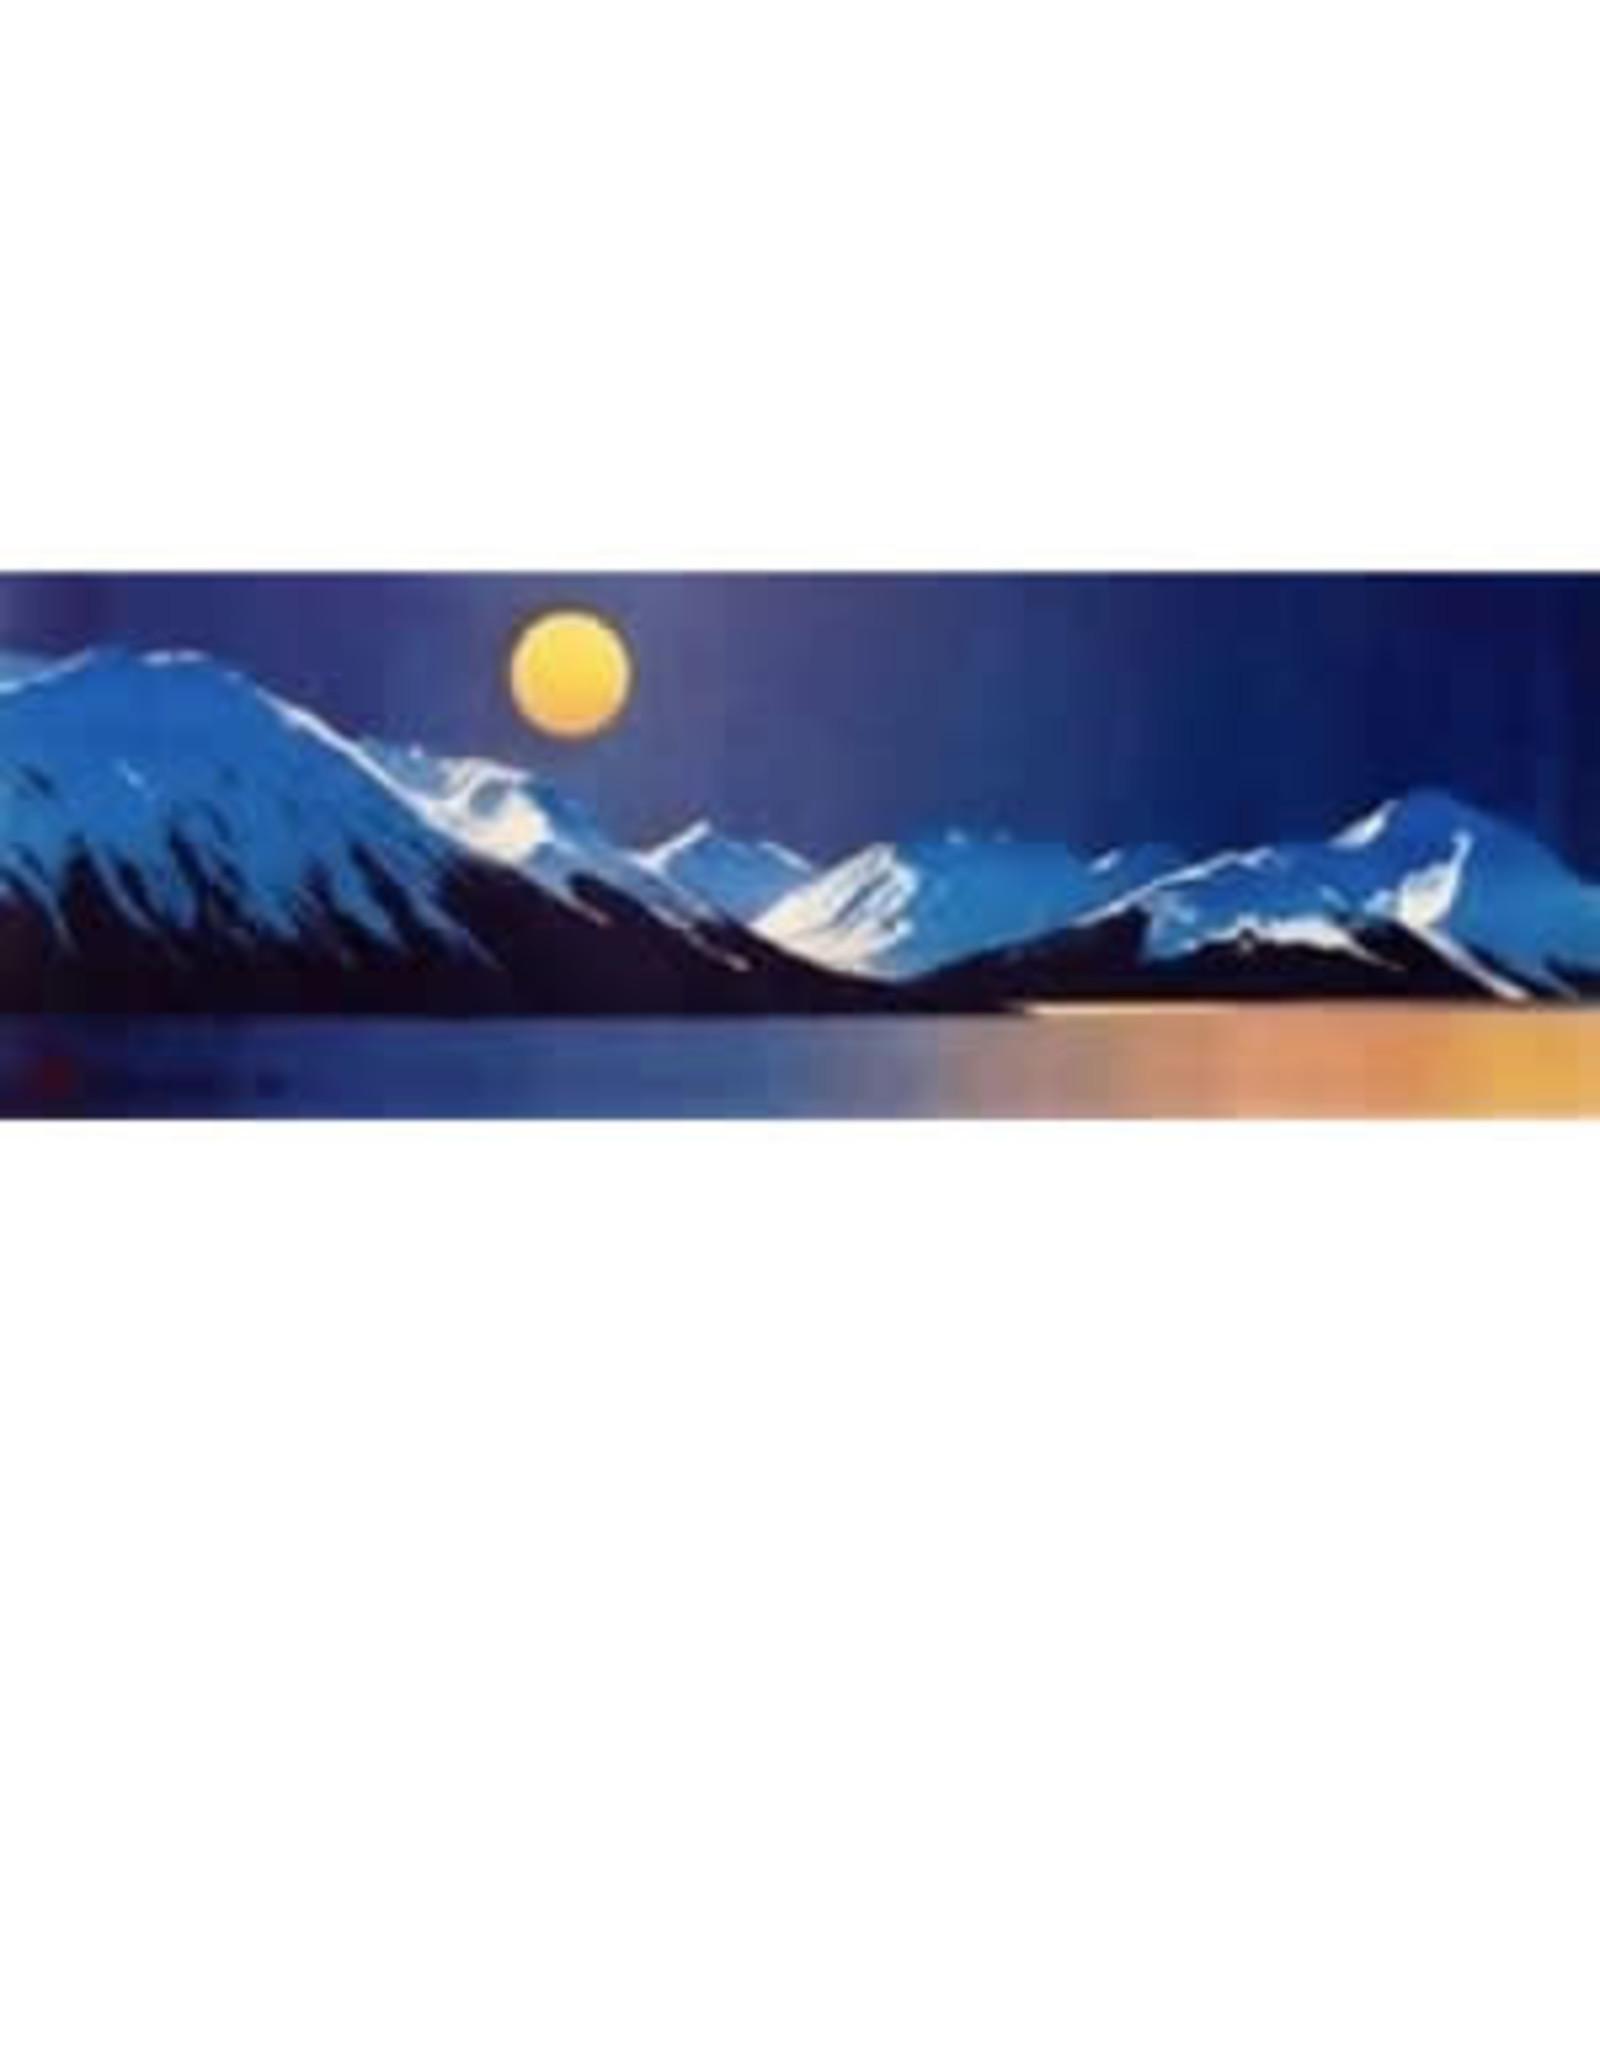 "Byron Birdsall Byron Birdsall ""And the Moon be Still as Bright"" art print"